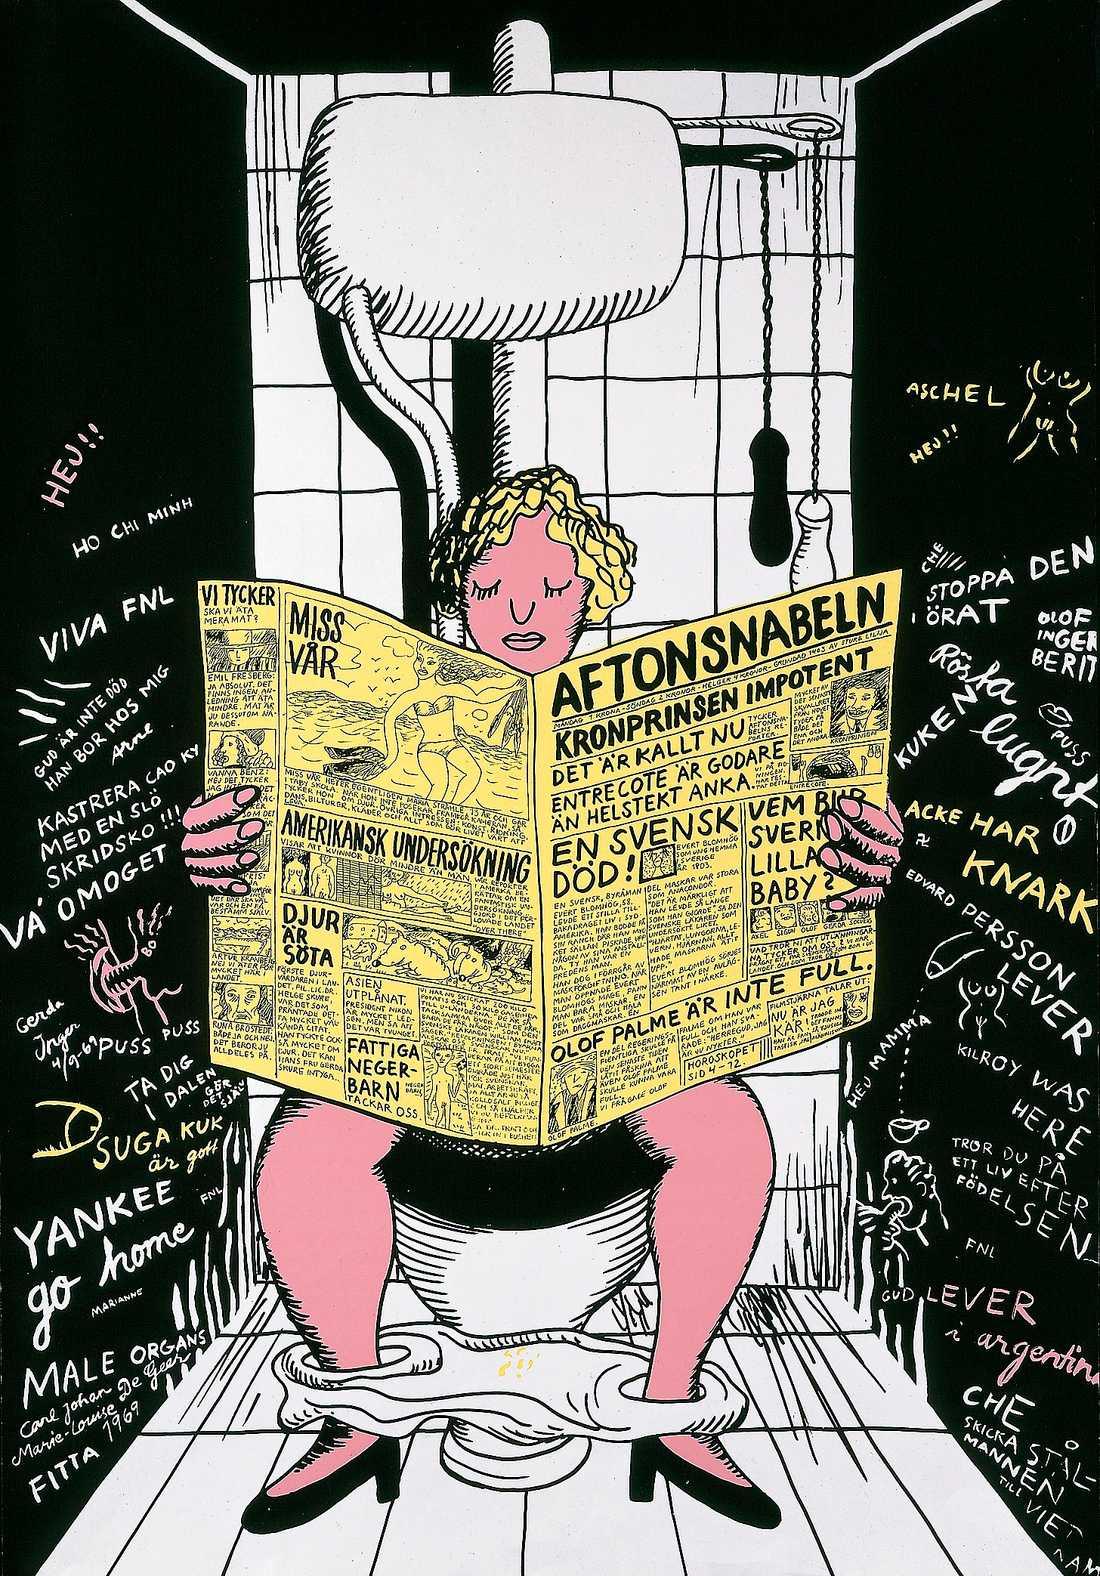 "Marie-Louise Ekman, ""På toaletten"" (Aftonsnabeln), 1969."